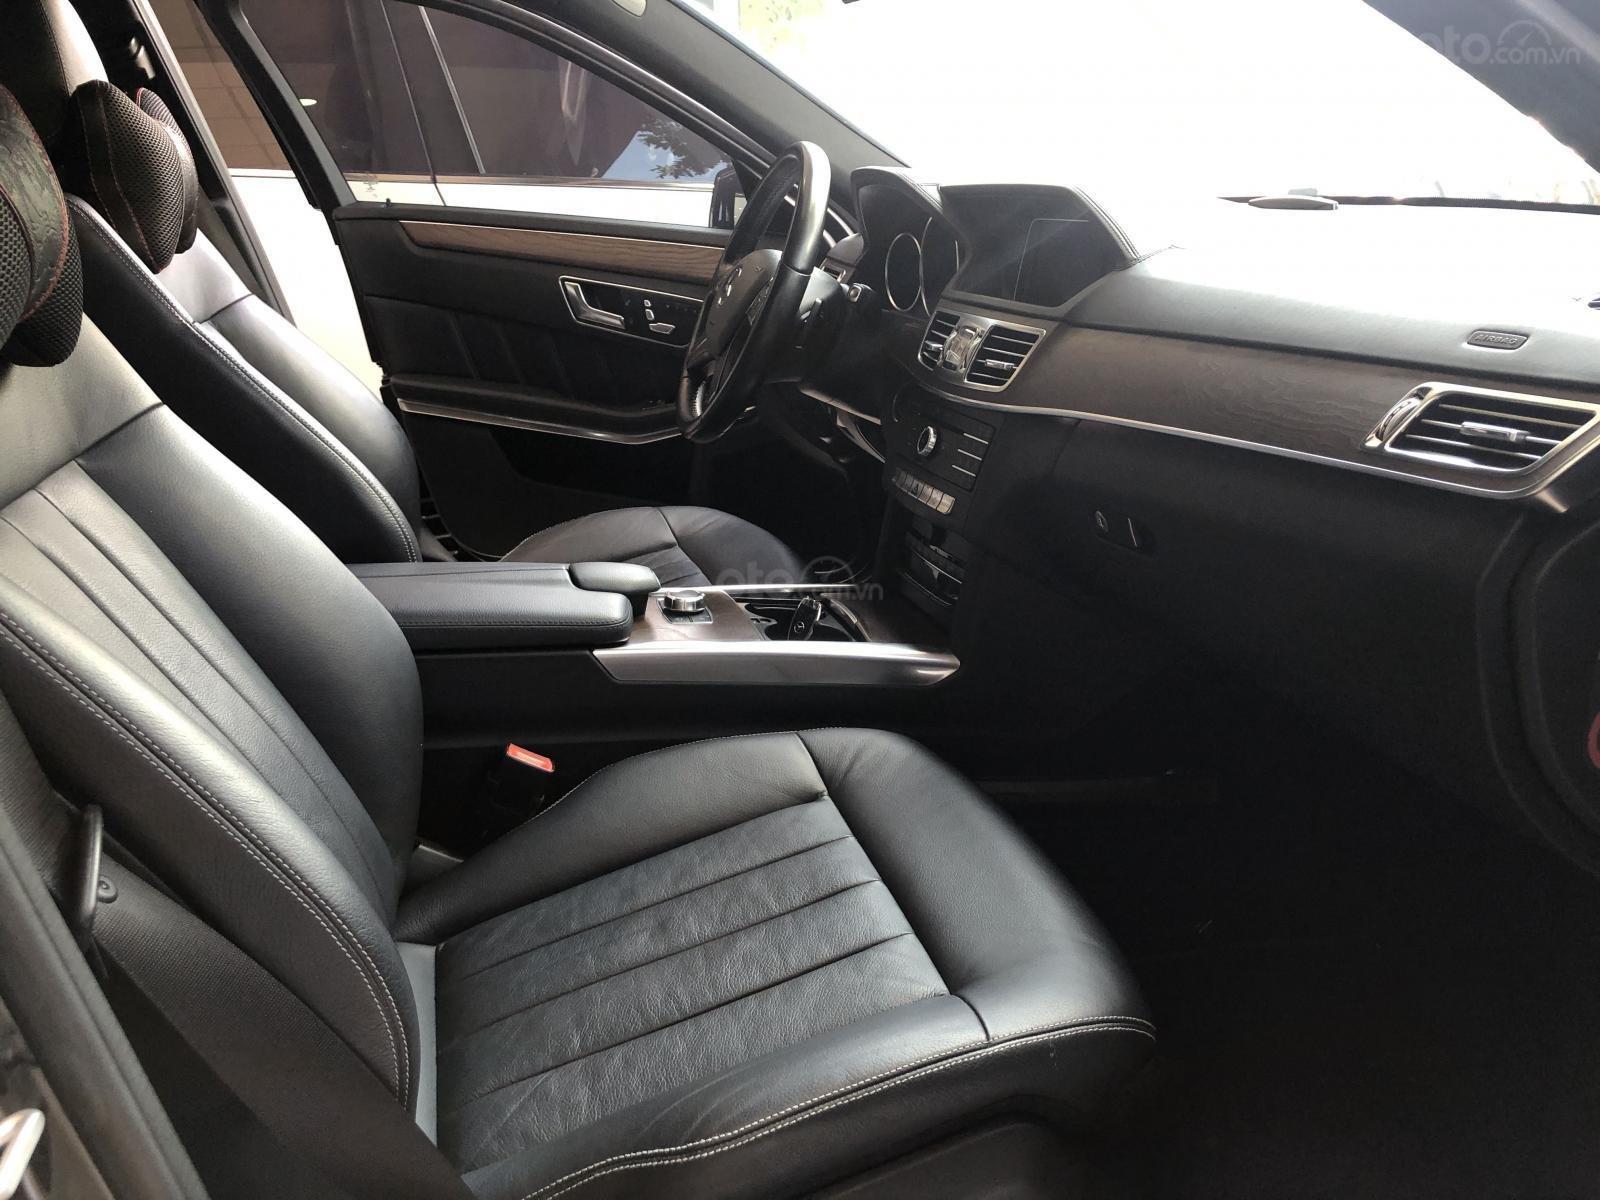 Cần bán xe Mercedes-Benz E200 sản xuất 2015, ĐKLĐ 2016 (11)